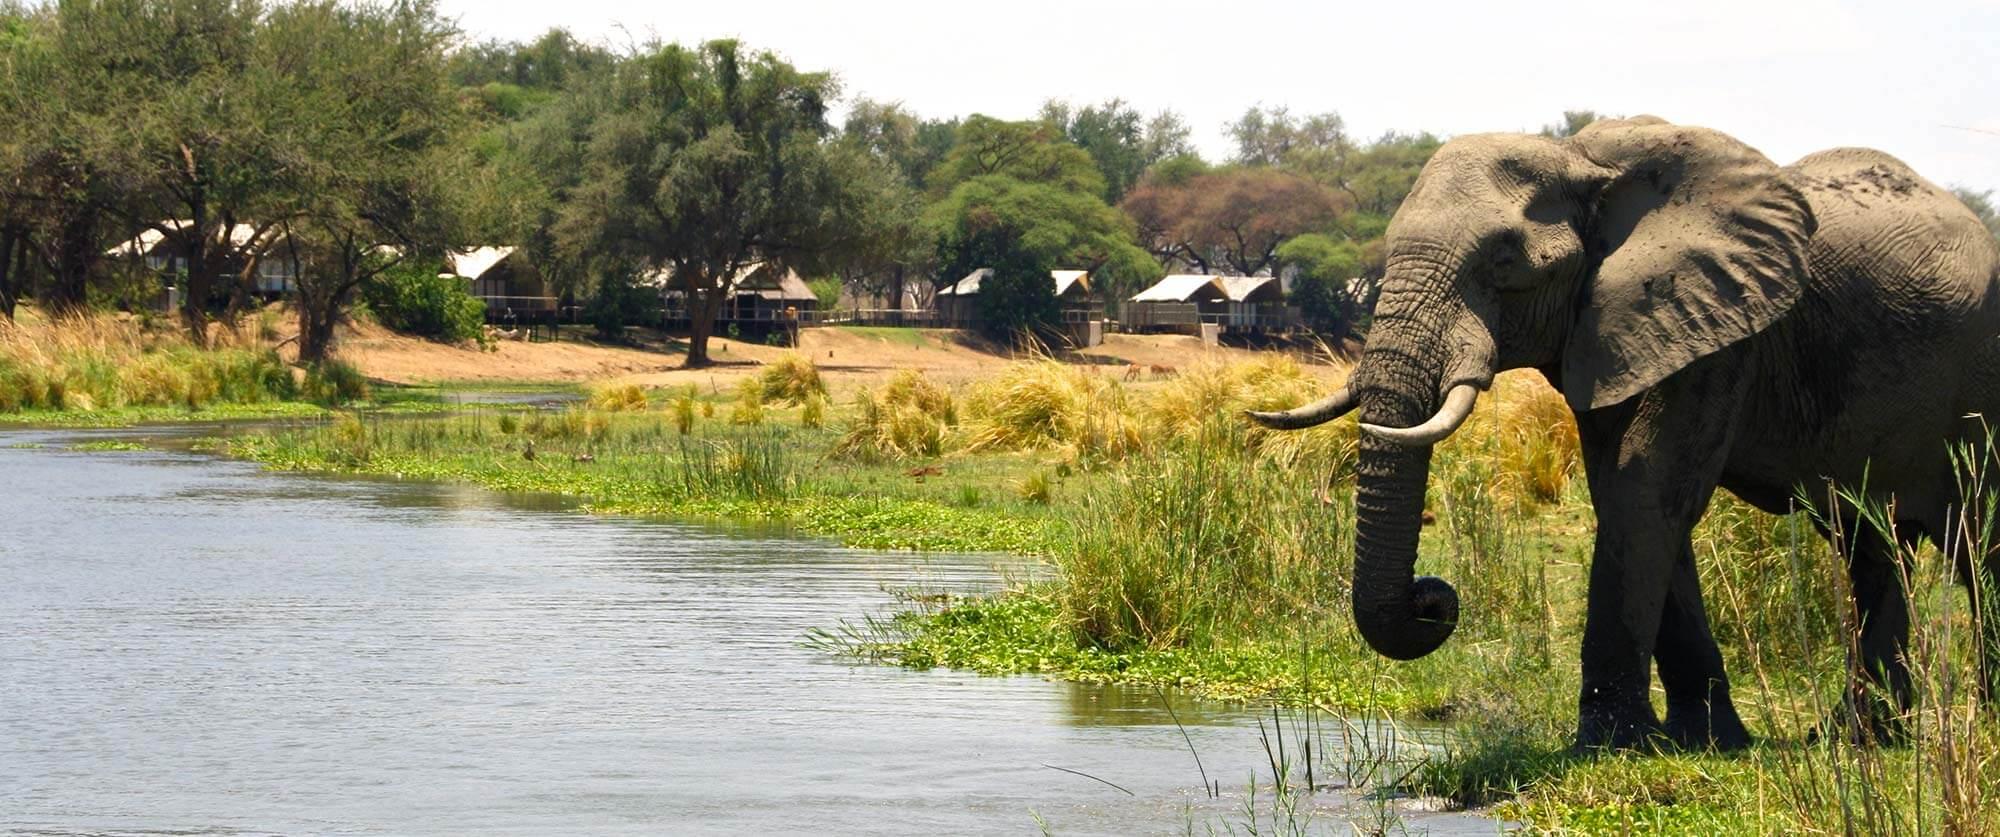 Elephant Drinking at Anabezi Luxury Tented Camp - Wildlife Safari and Beach: Zambia and Lake Malawi Luxury Tour